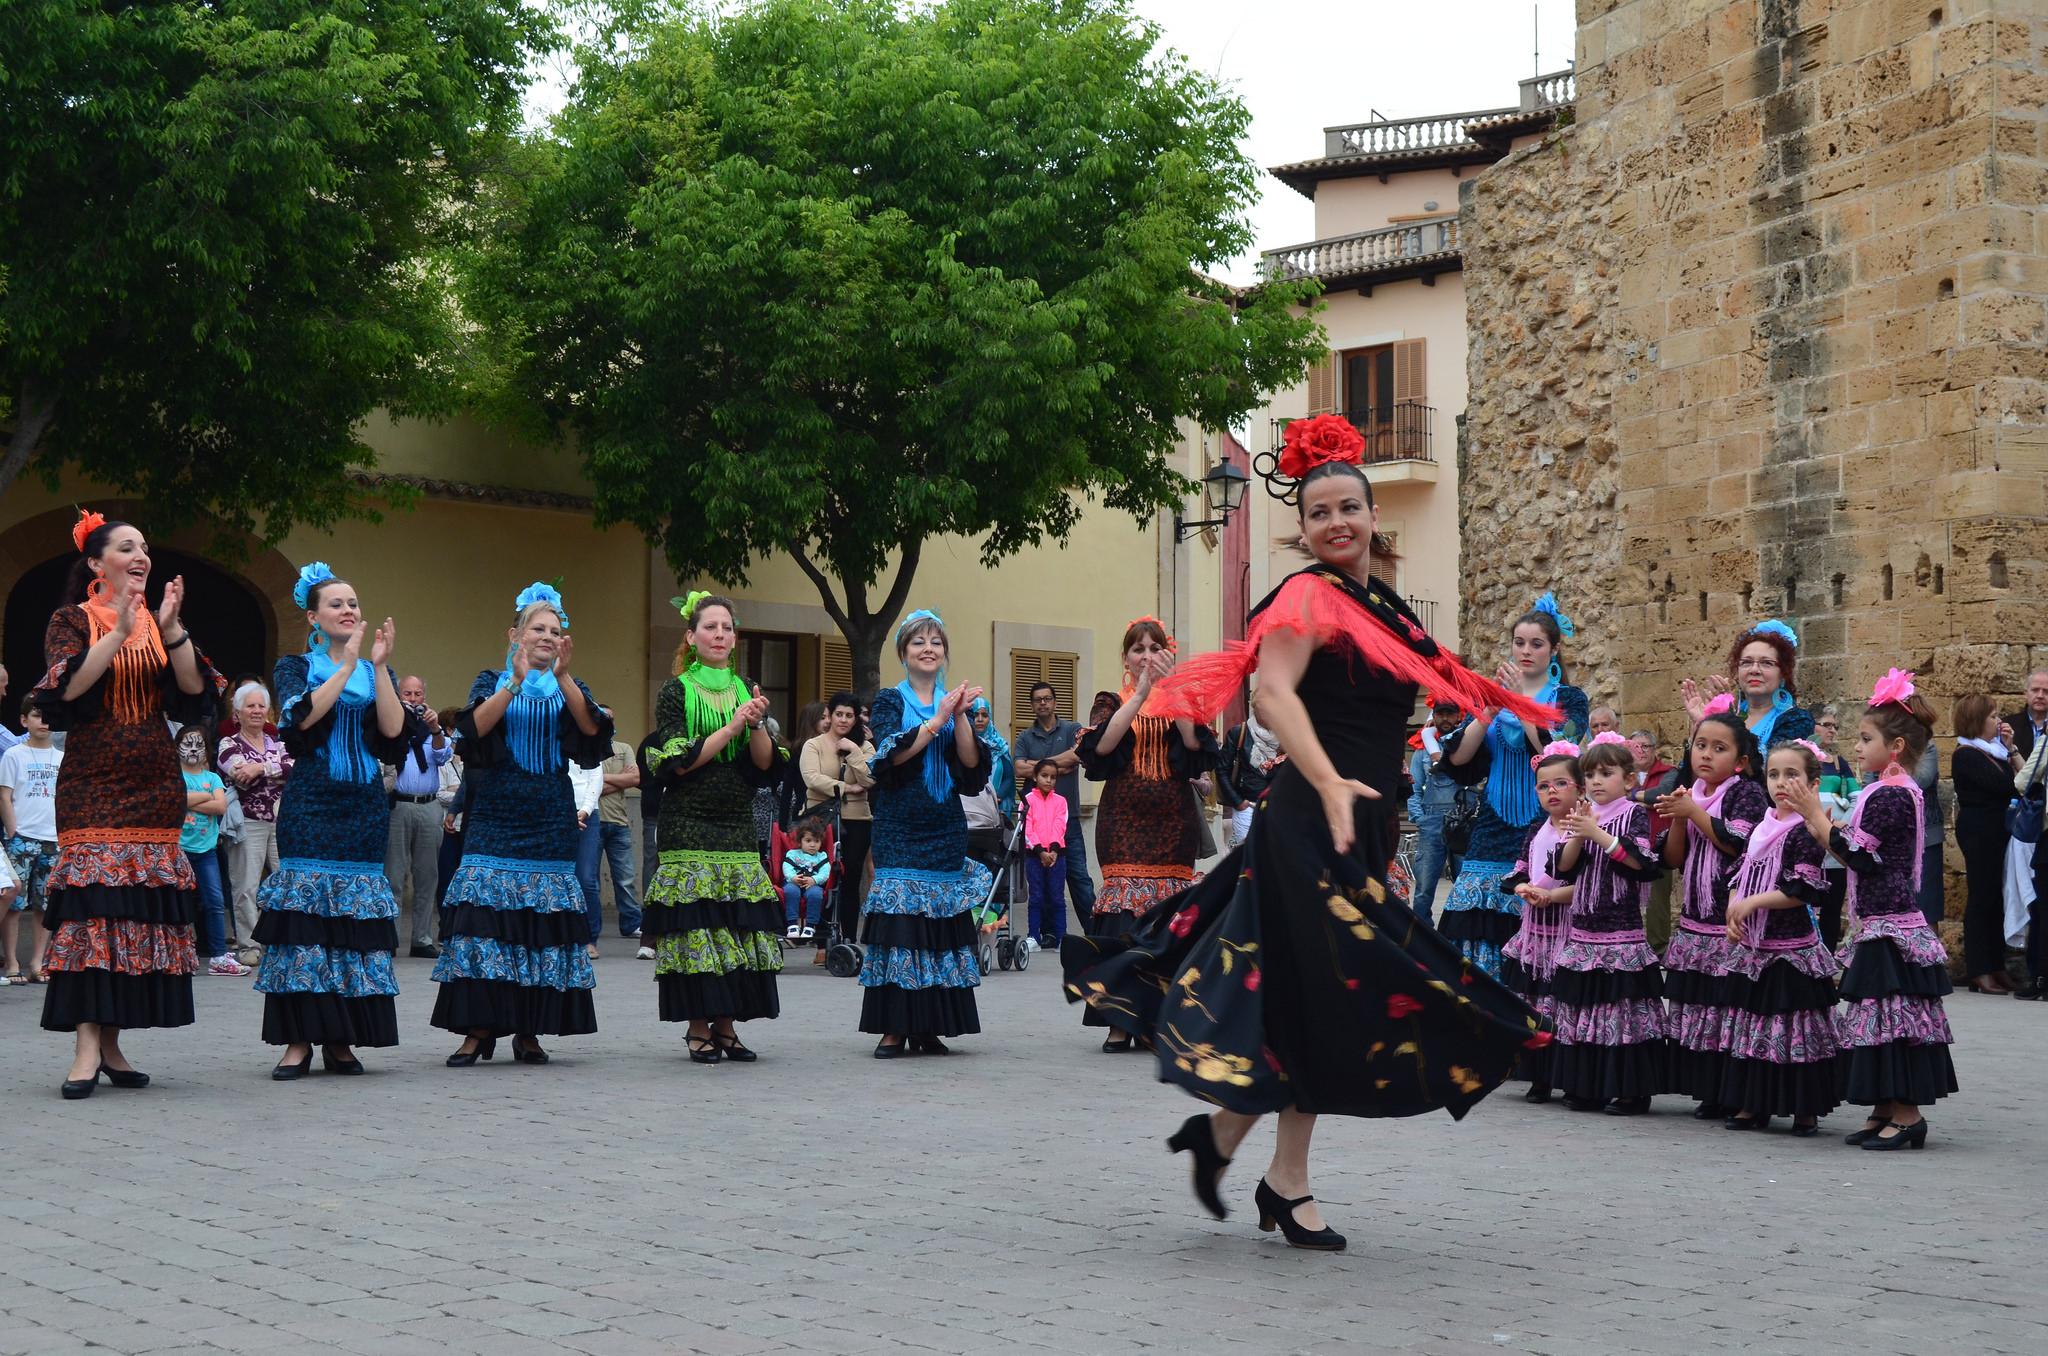 A Sevillana performance outdoors © Morfheos